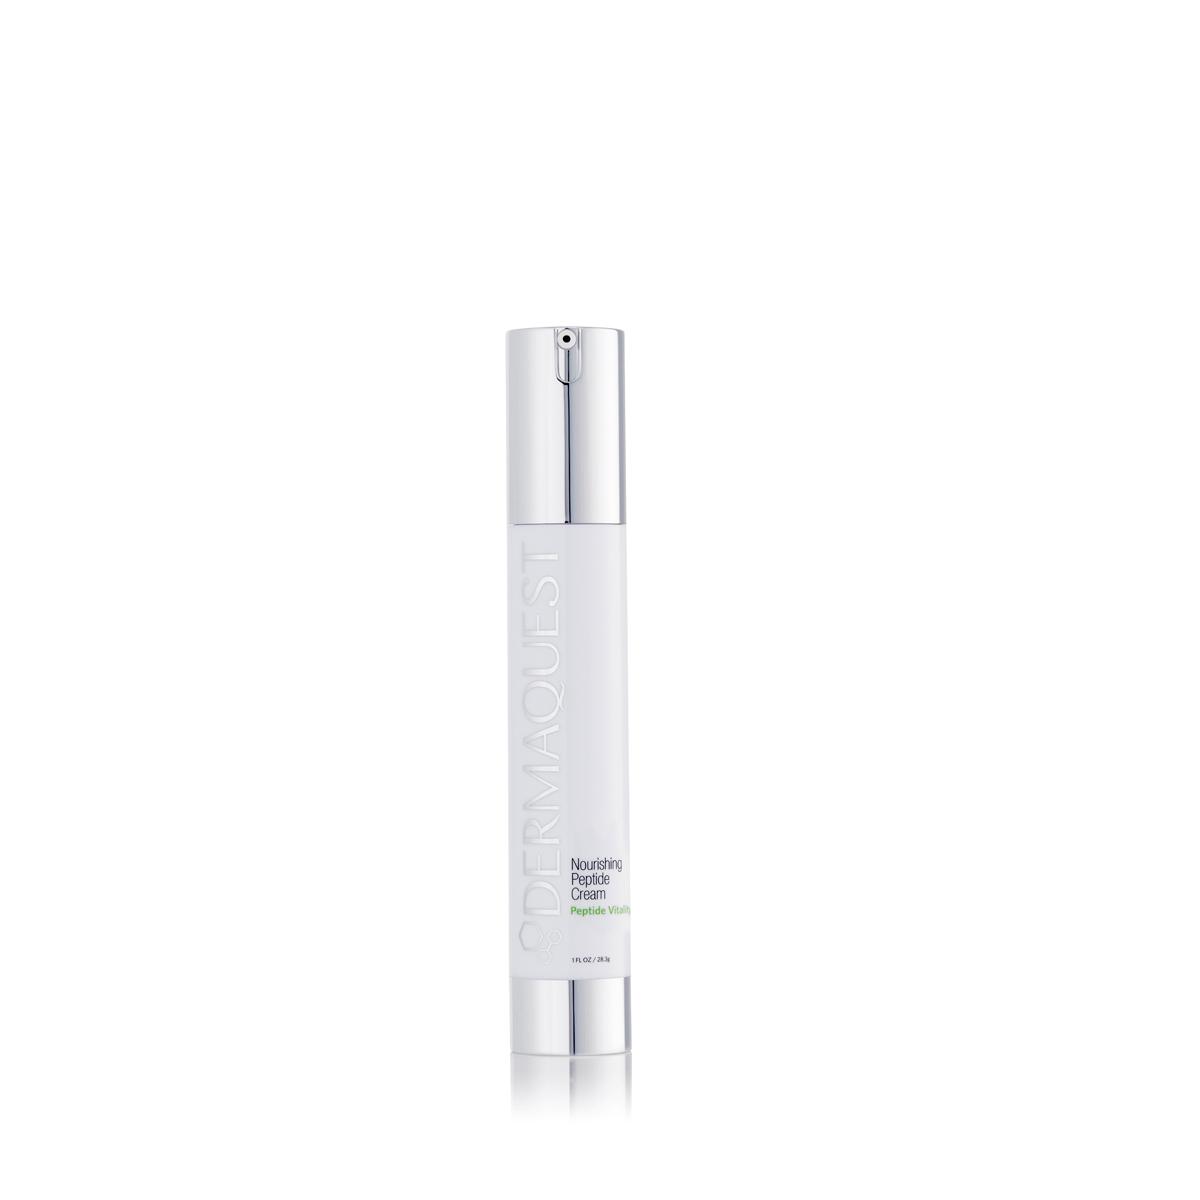 Nourishing Peptide Cream – Peptide Vitality